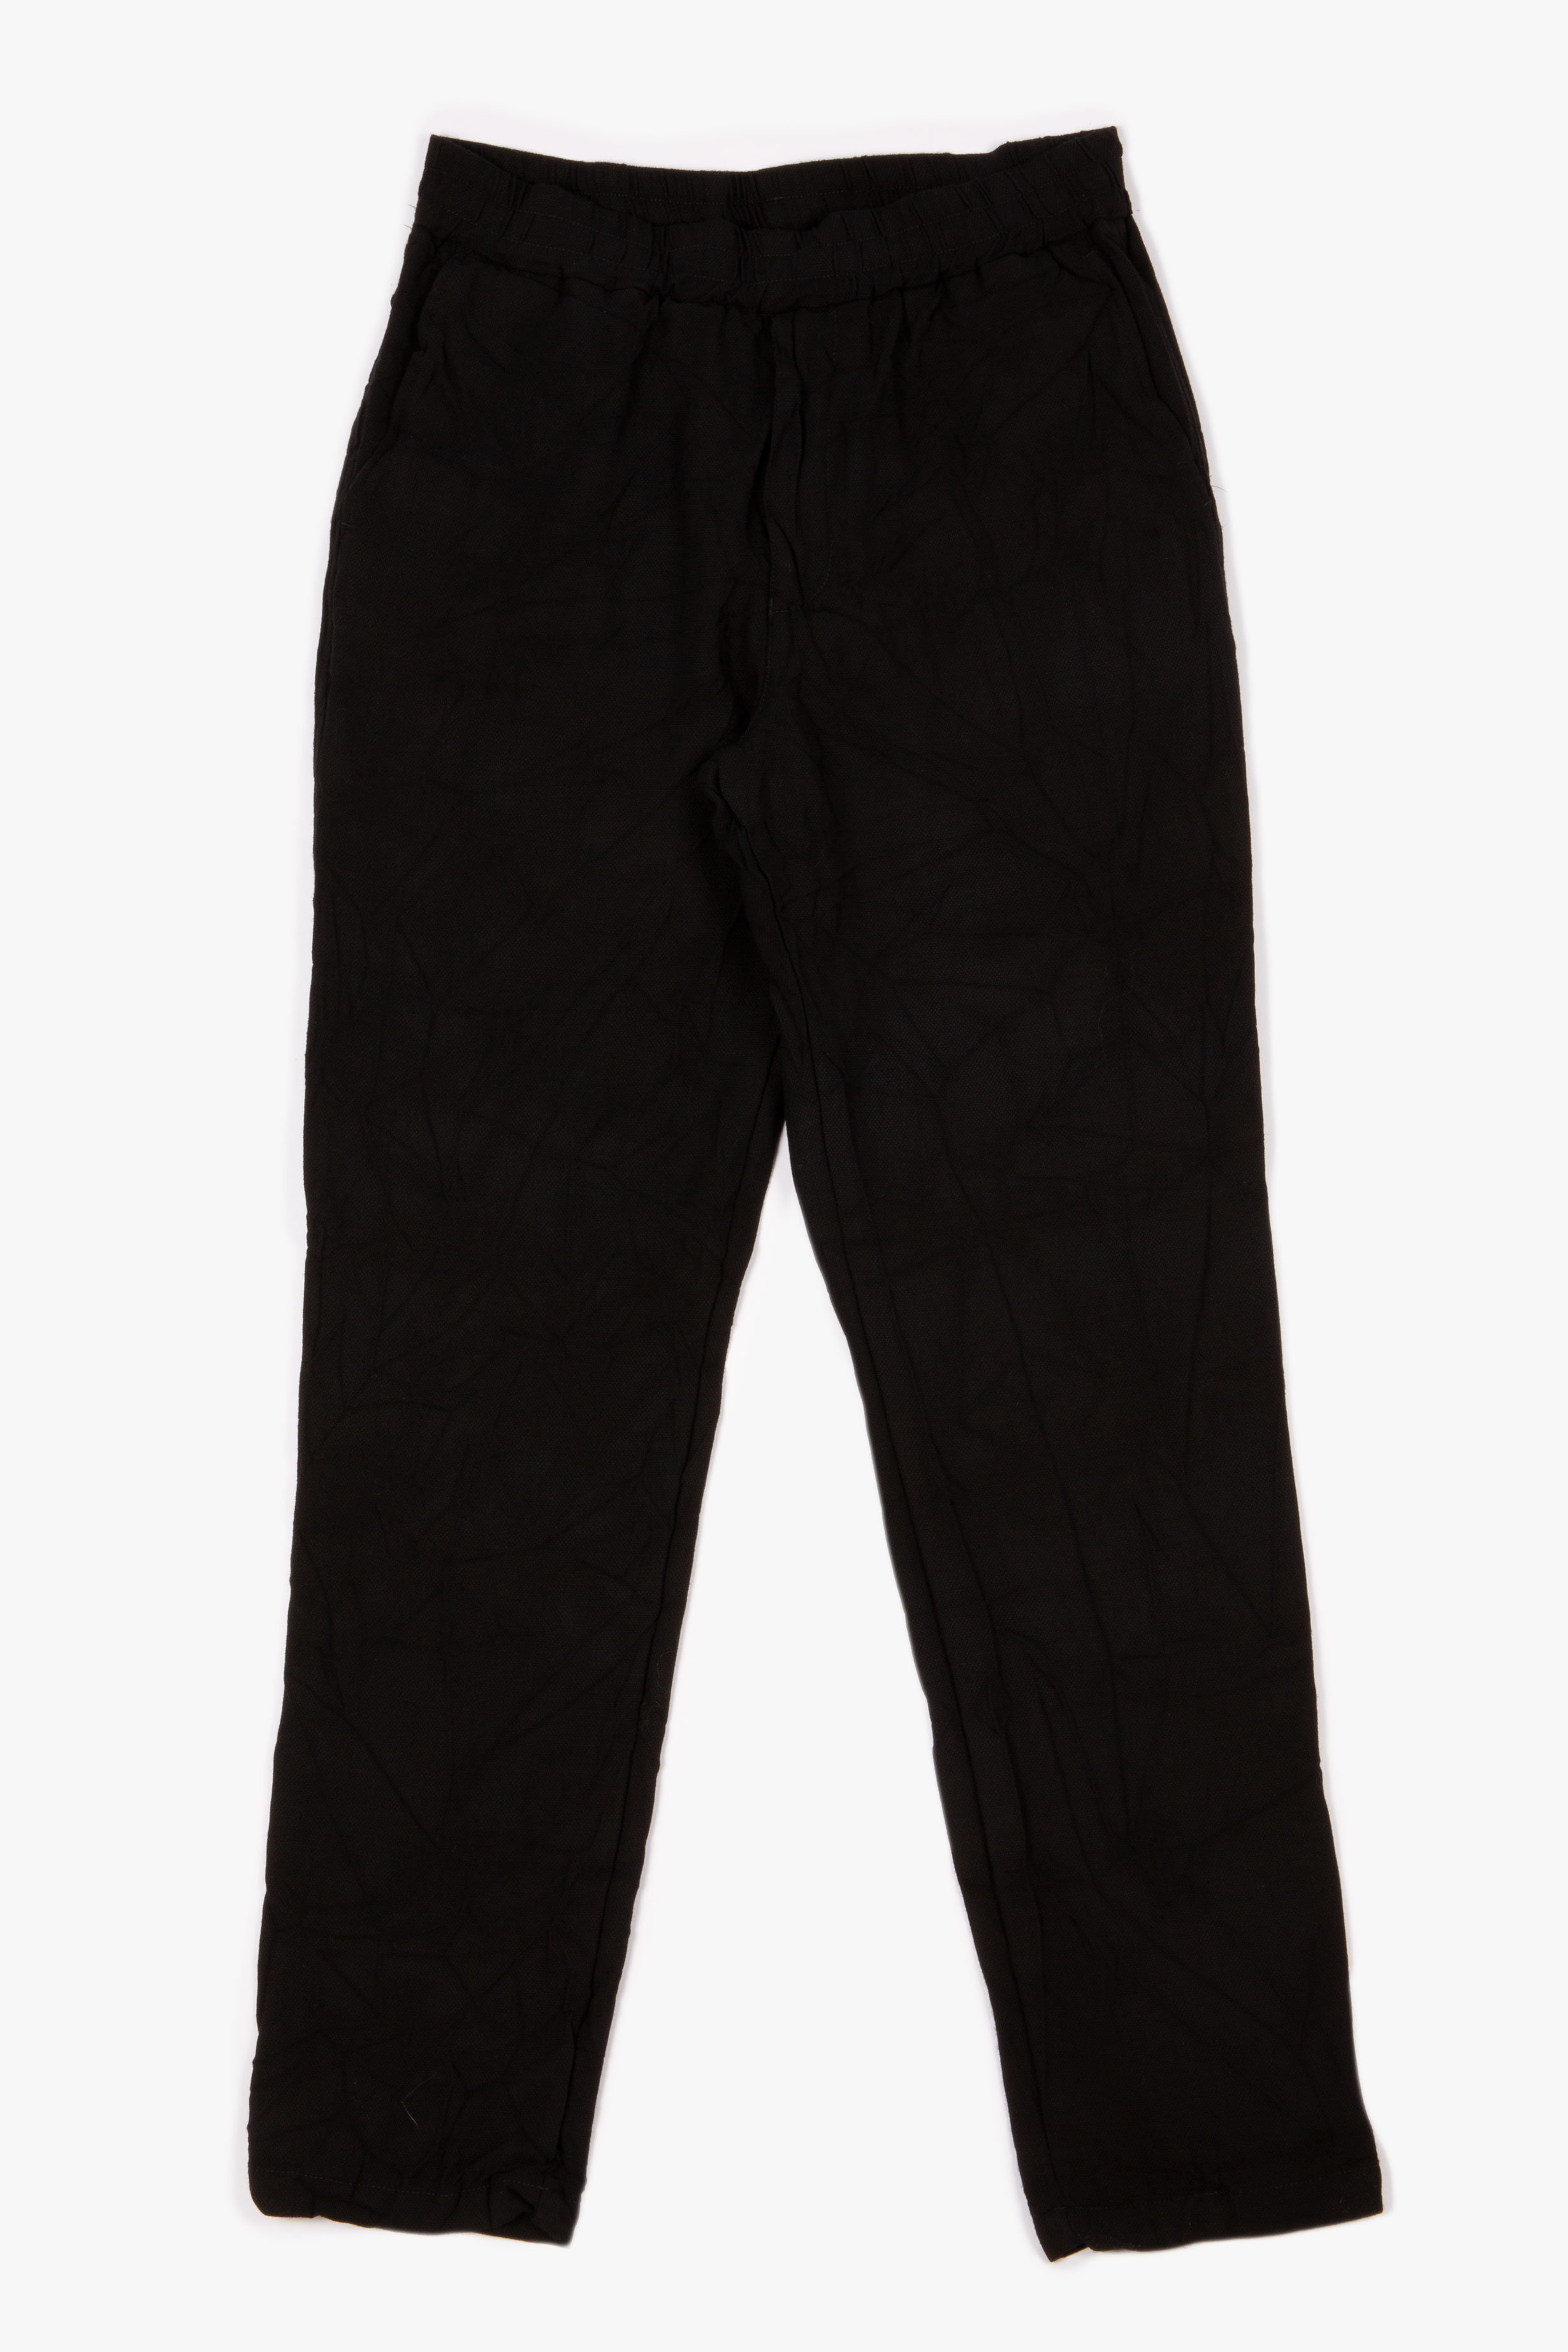 Bragola Trousers Anthracite